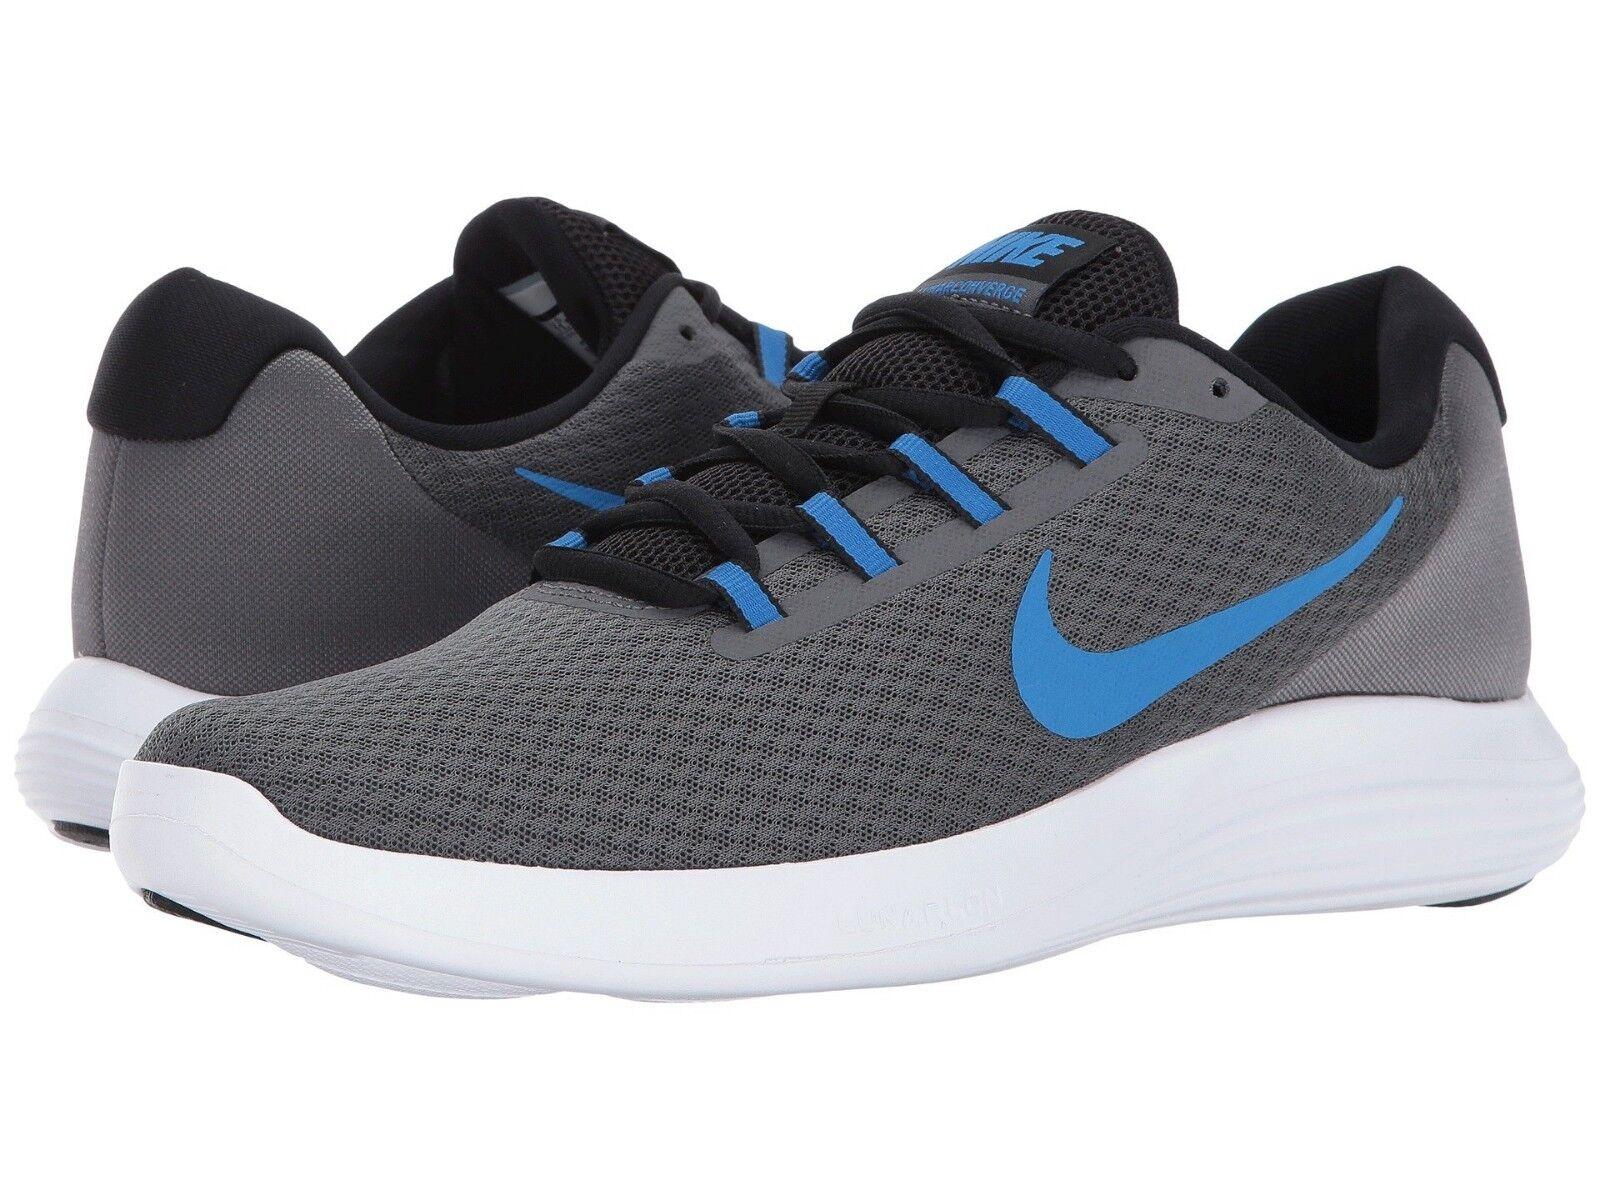 Nike Lunar Converge Running Shoe Mens Size 9.5 Grey Italy Blue 852462 008